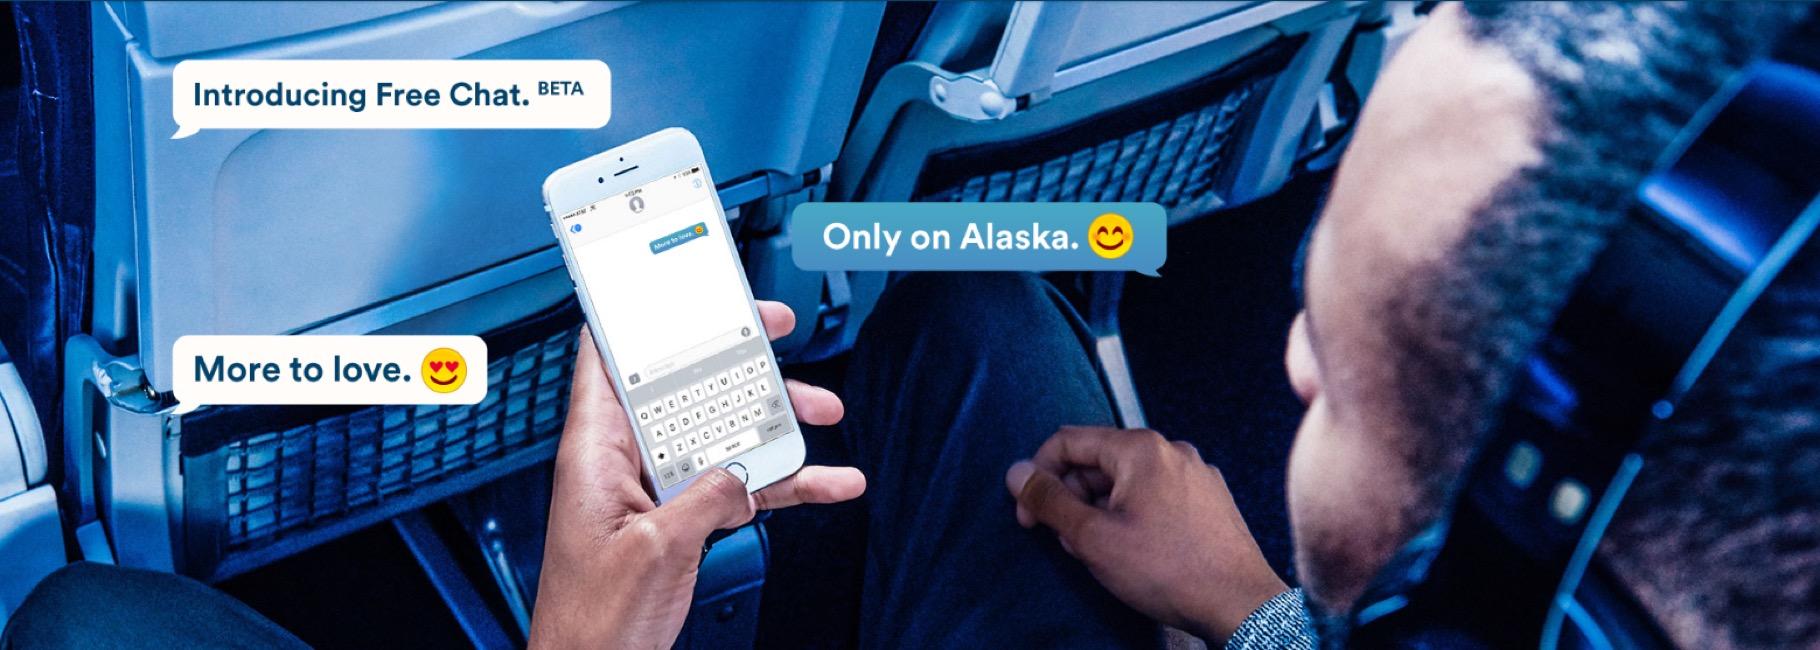 Alaska Free Chat